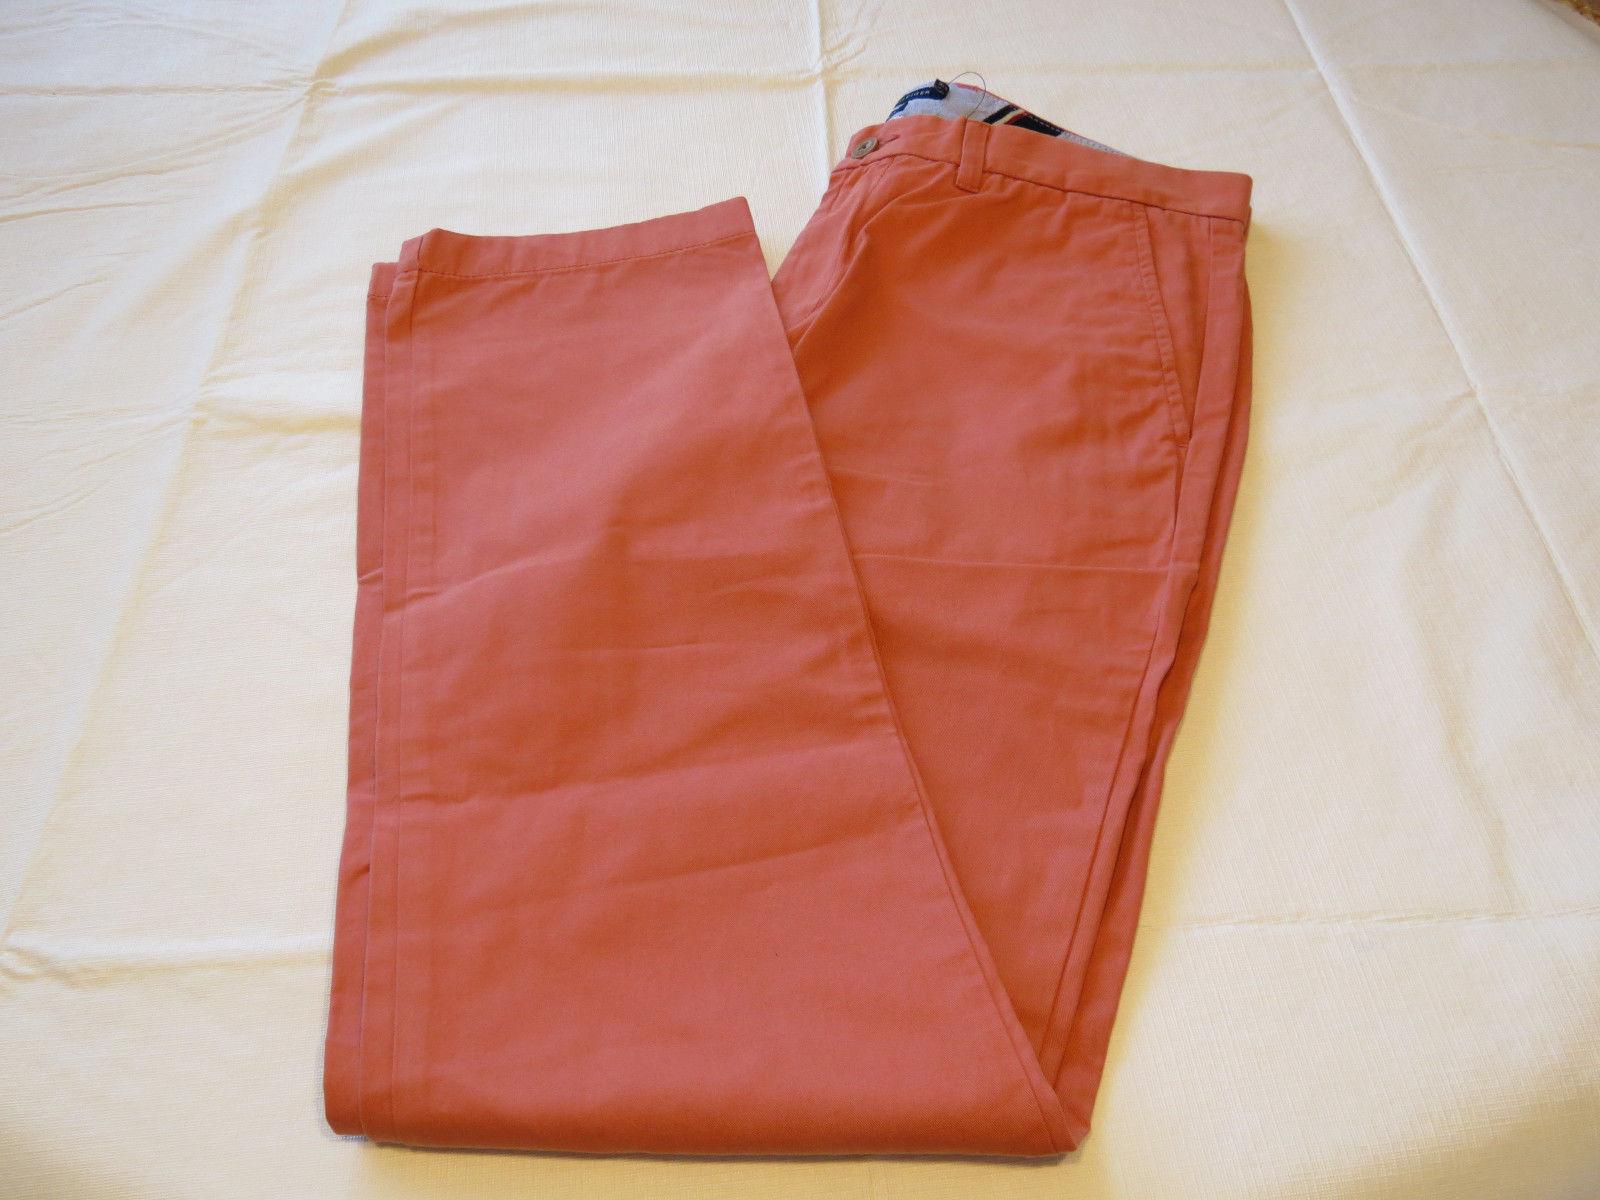 Stretch Twill Fabric Size 32-40 Tommy Hilfiger Men/'s Chino Pant NO TAX